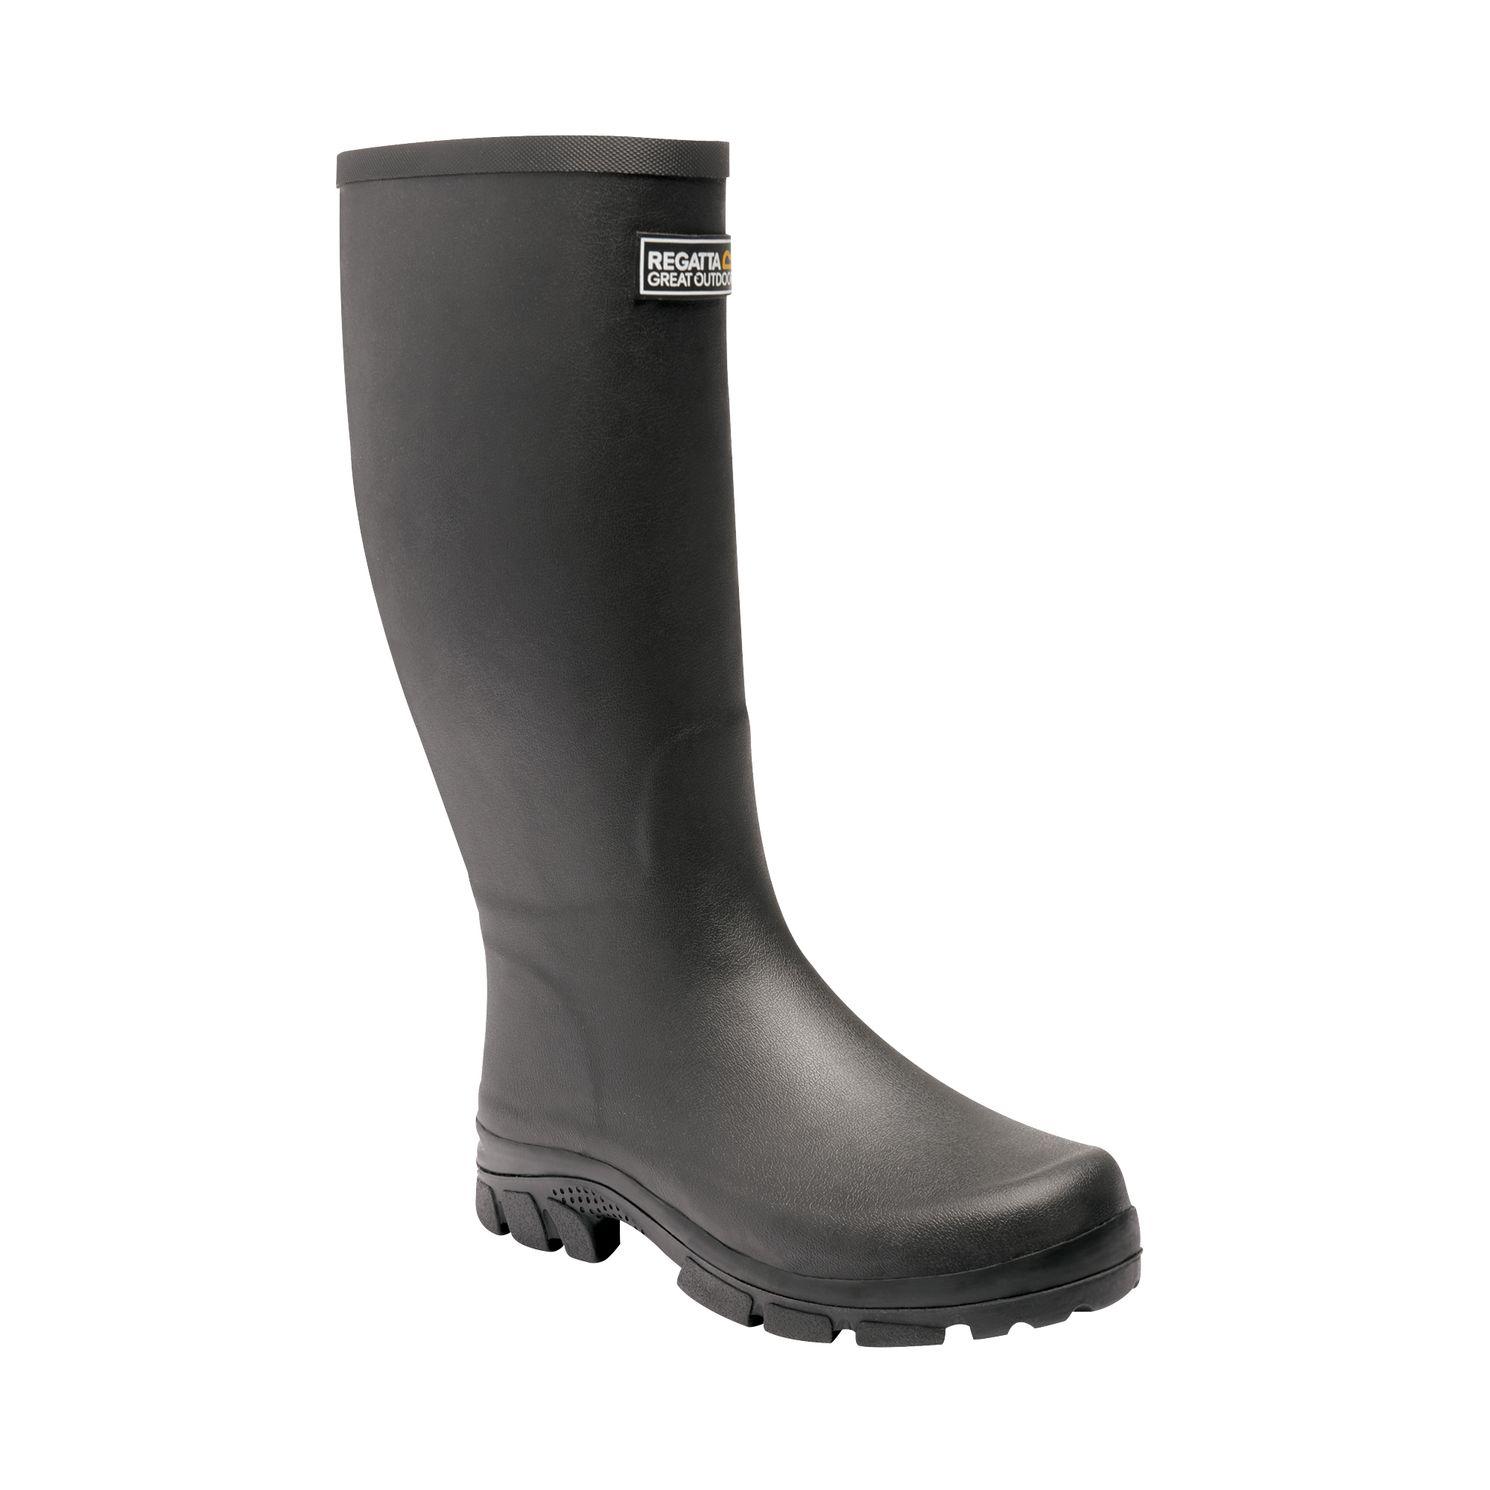 Men's black wellington boot.